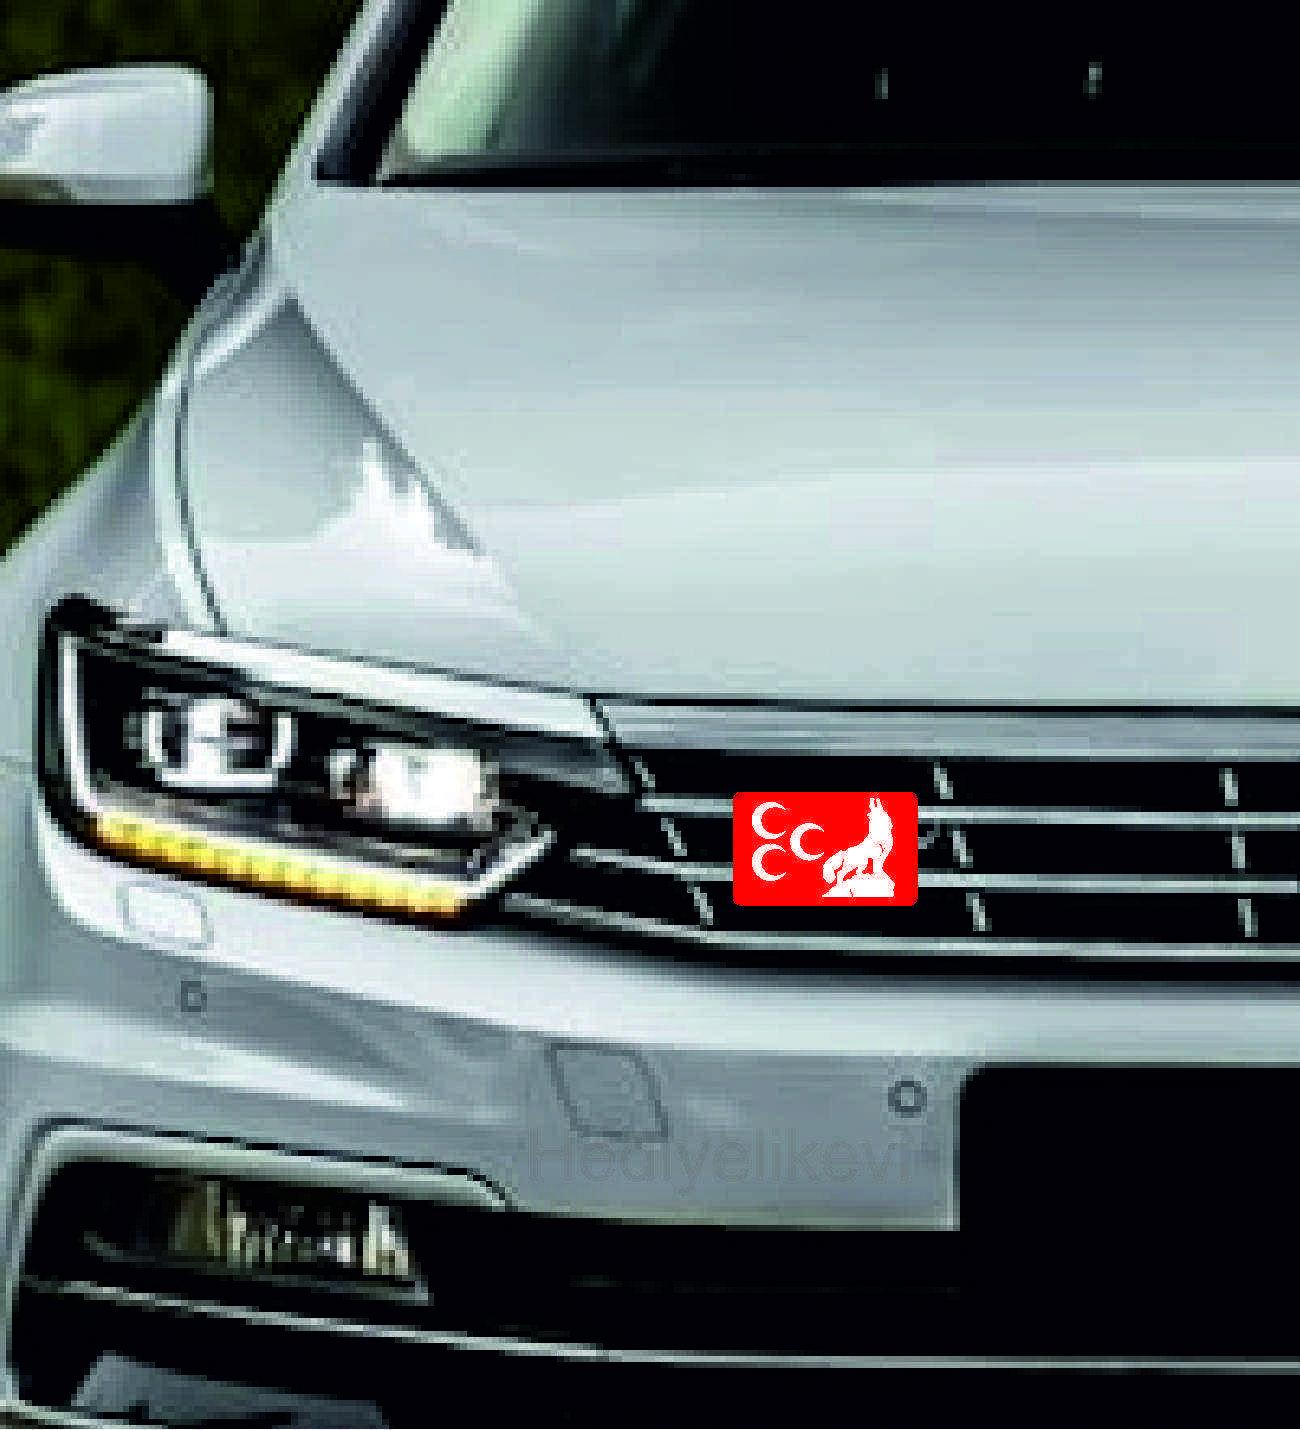 Araç Ön Panjur Logosu Panjur Arma Kurt Üç Hilal logolu